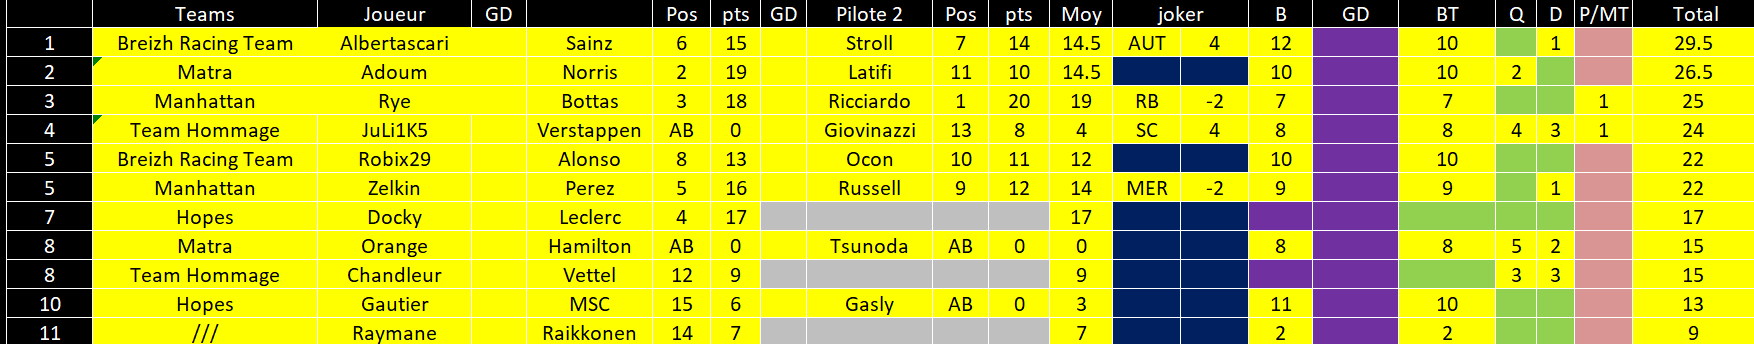 [FMWC] Topic du championnat 2021 - Page 22 Monza-10